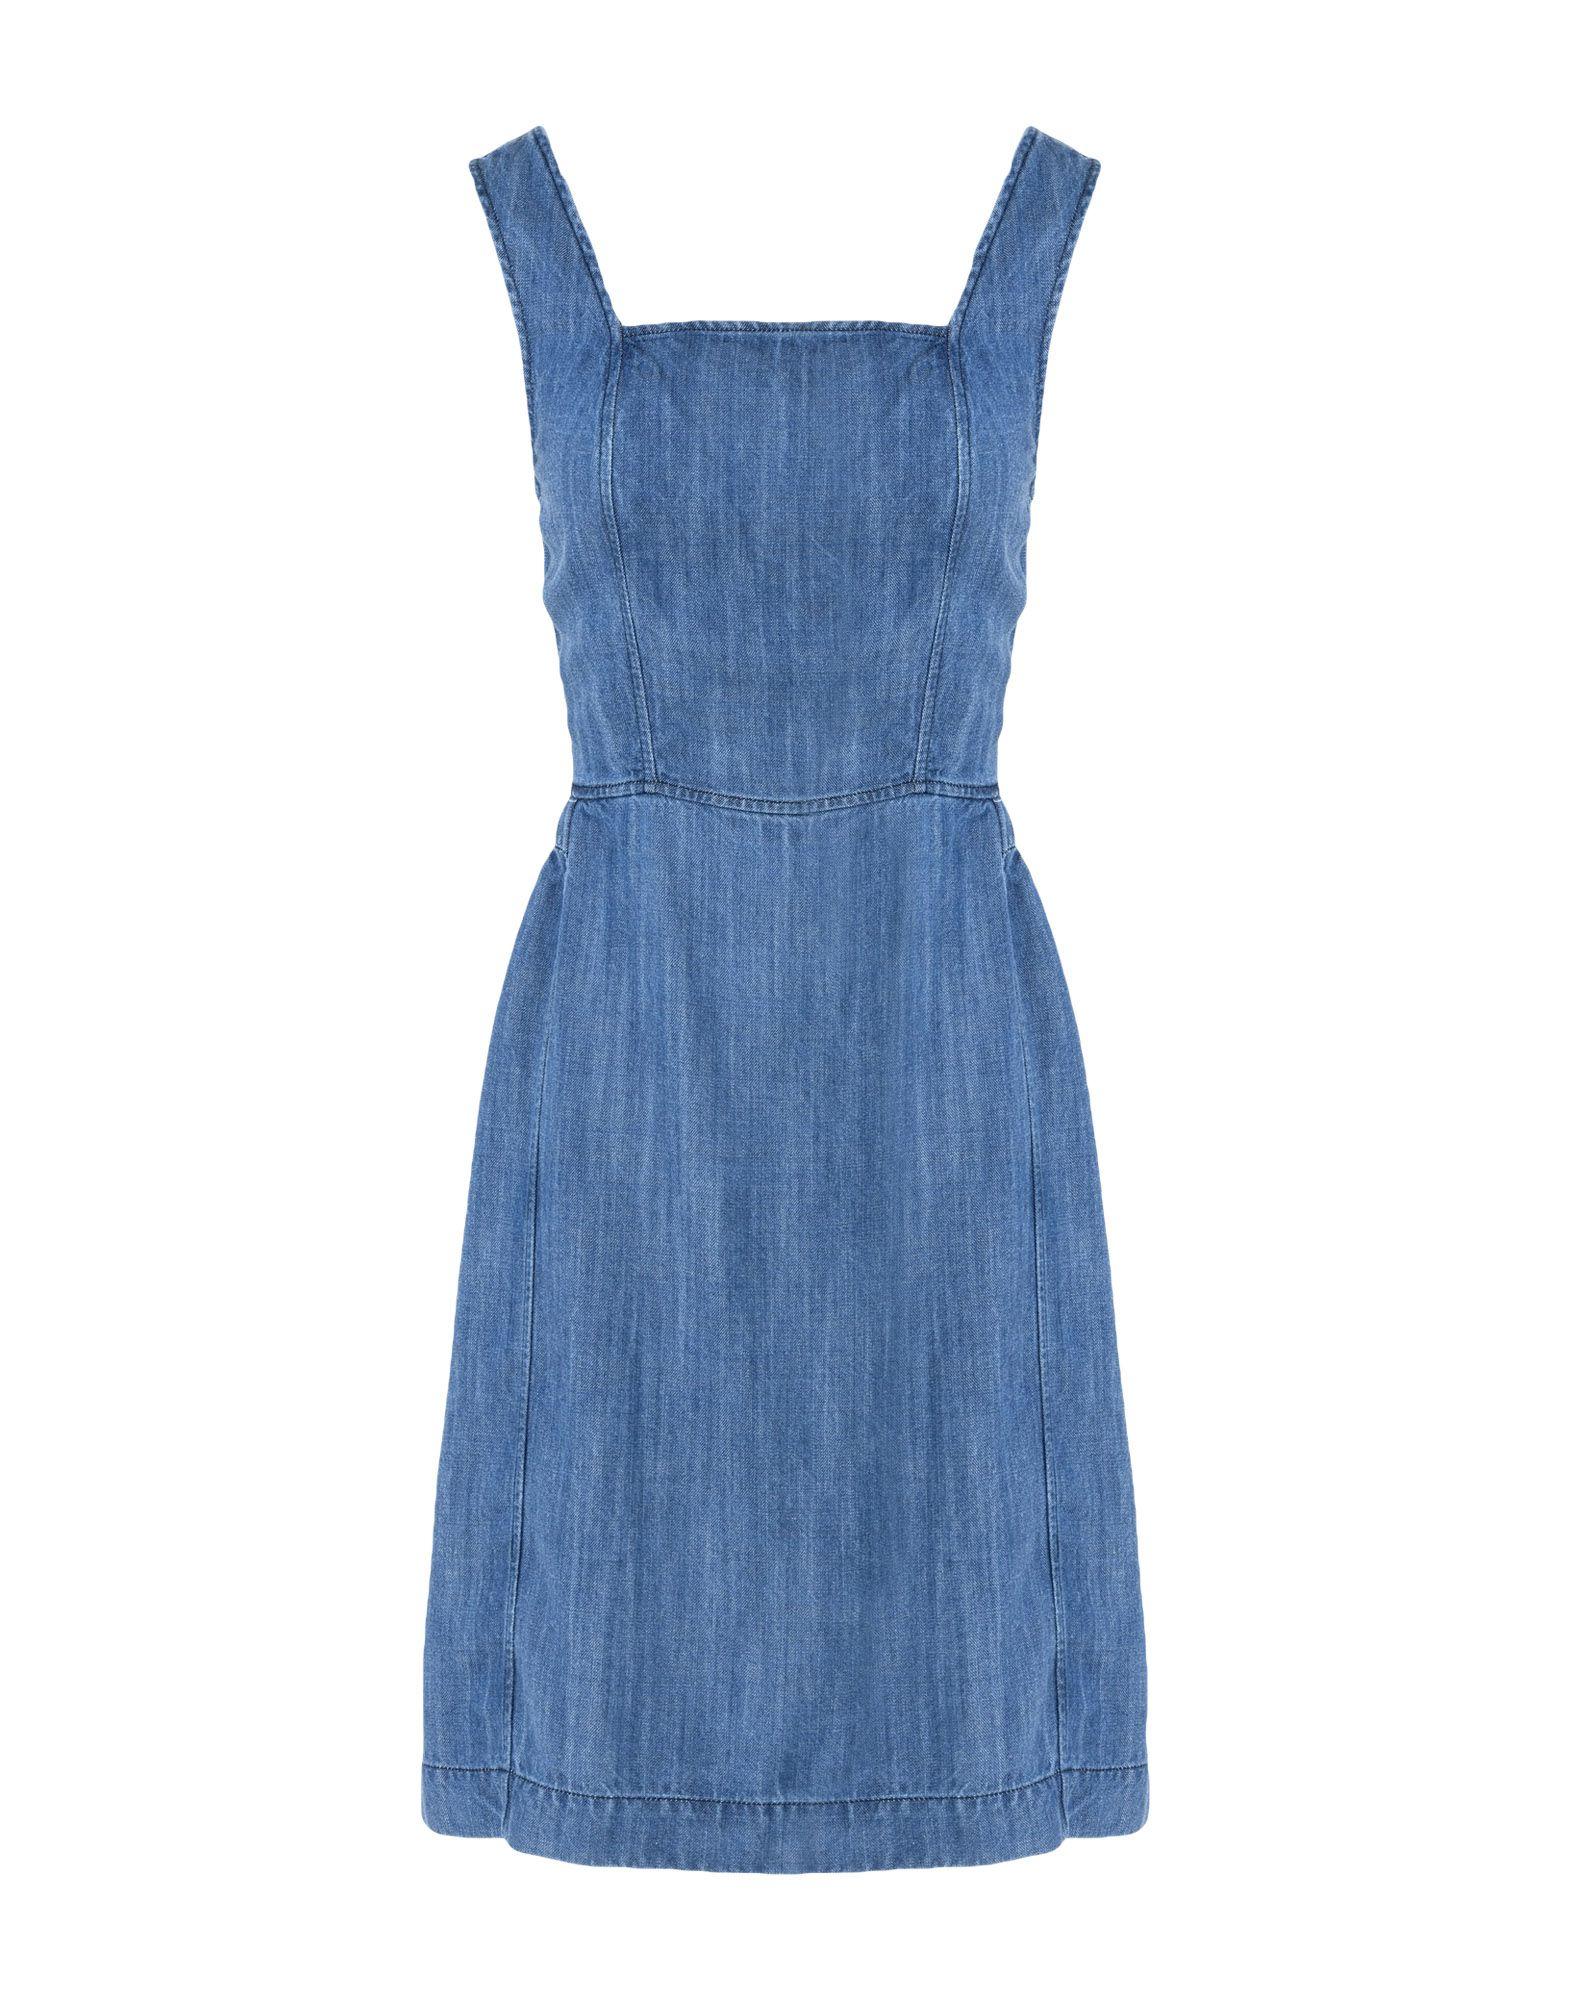 8 Короткое платье nikamo короткое платье